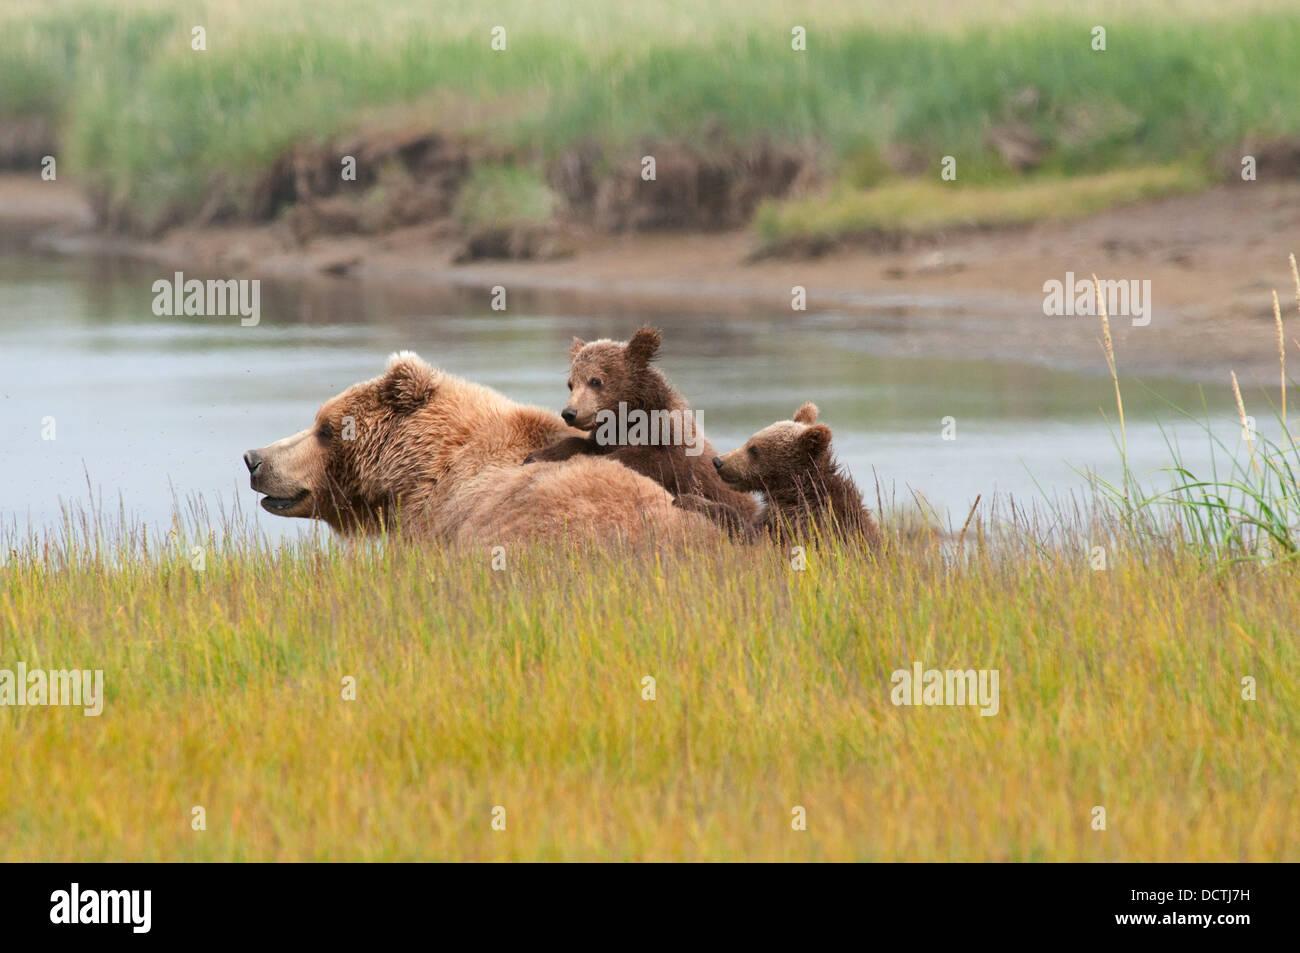 Un marrone Orso grizzly (Ursus arctos horribilis) con i suoi due cuccioli; Alaska, Stati Uniti d'America Immagini Stock